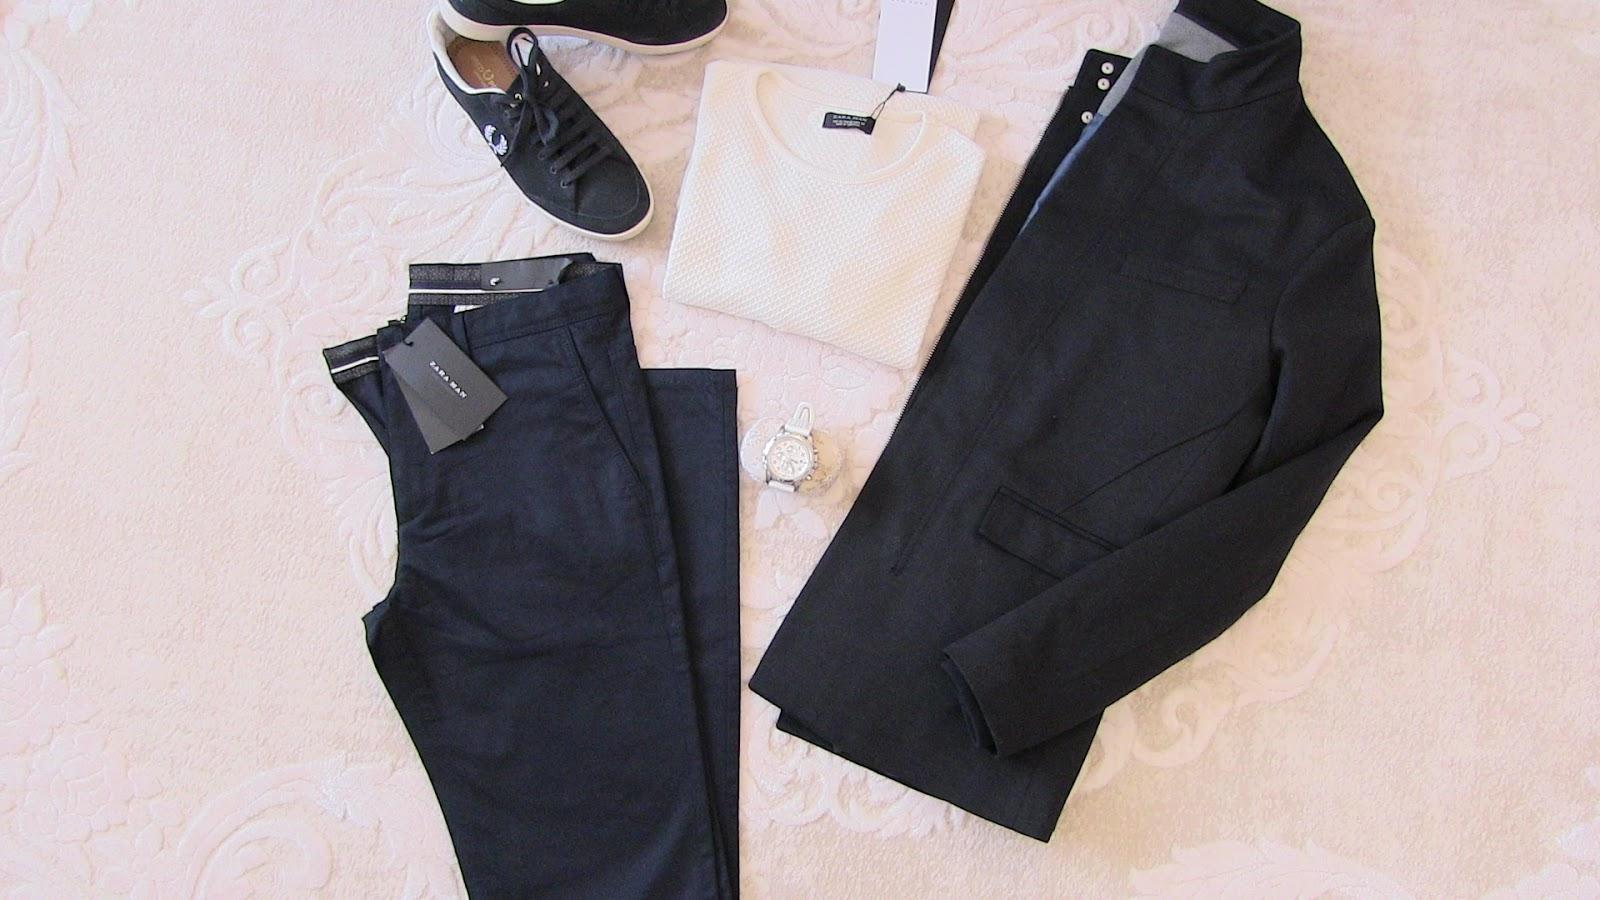 zara lacivert pantolon, zara kapşonlu lacivert mont, zara beyaz ince triko, fred perry ayakkabı